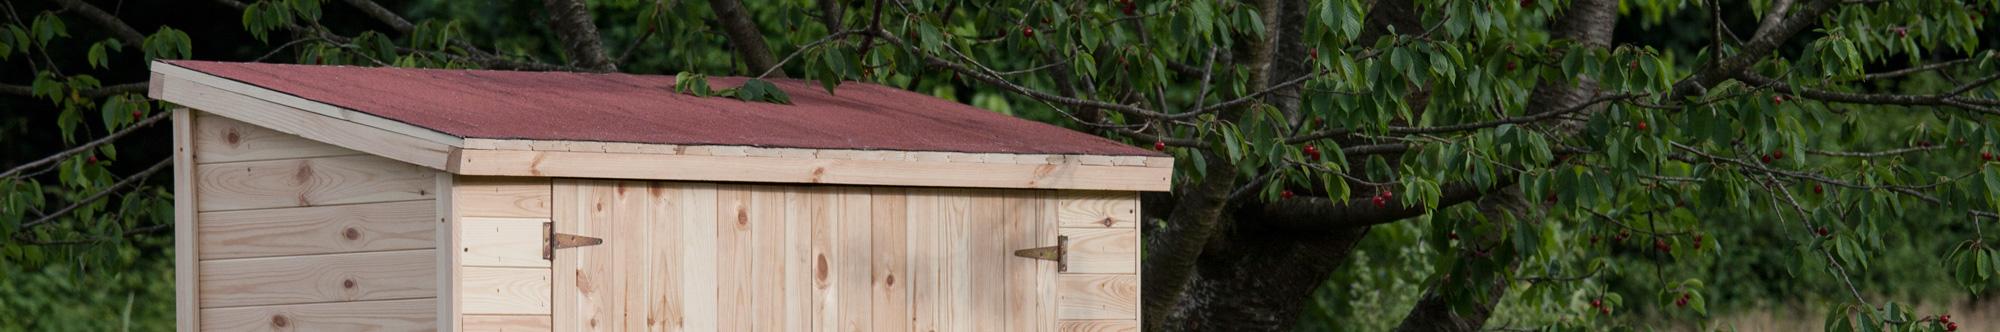 Casette da giardino casette in legno o resina offerte onlywood - Casette da giardino in resina ...